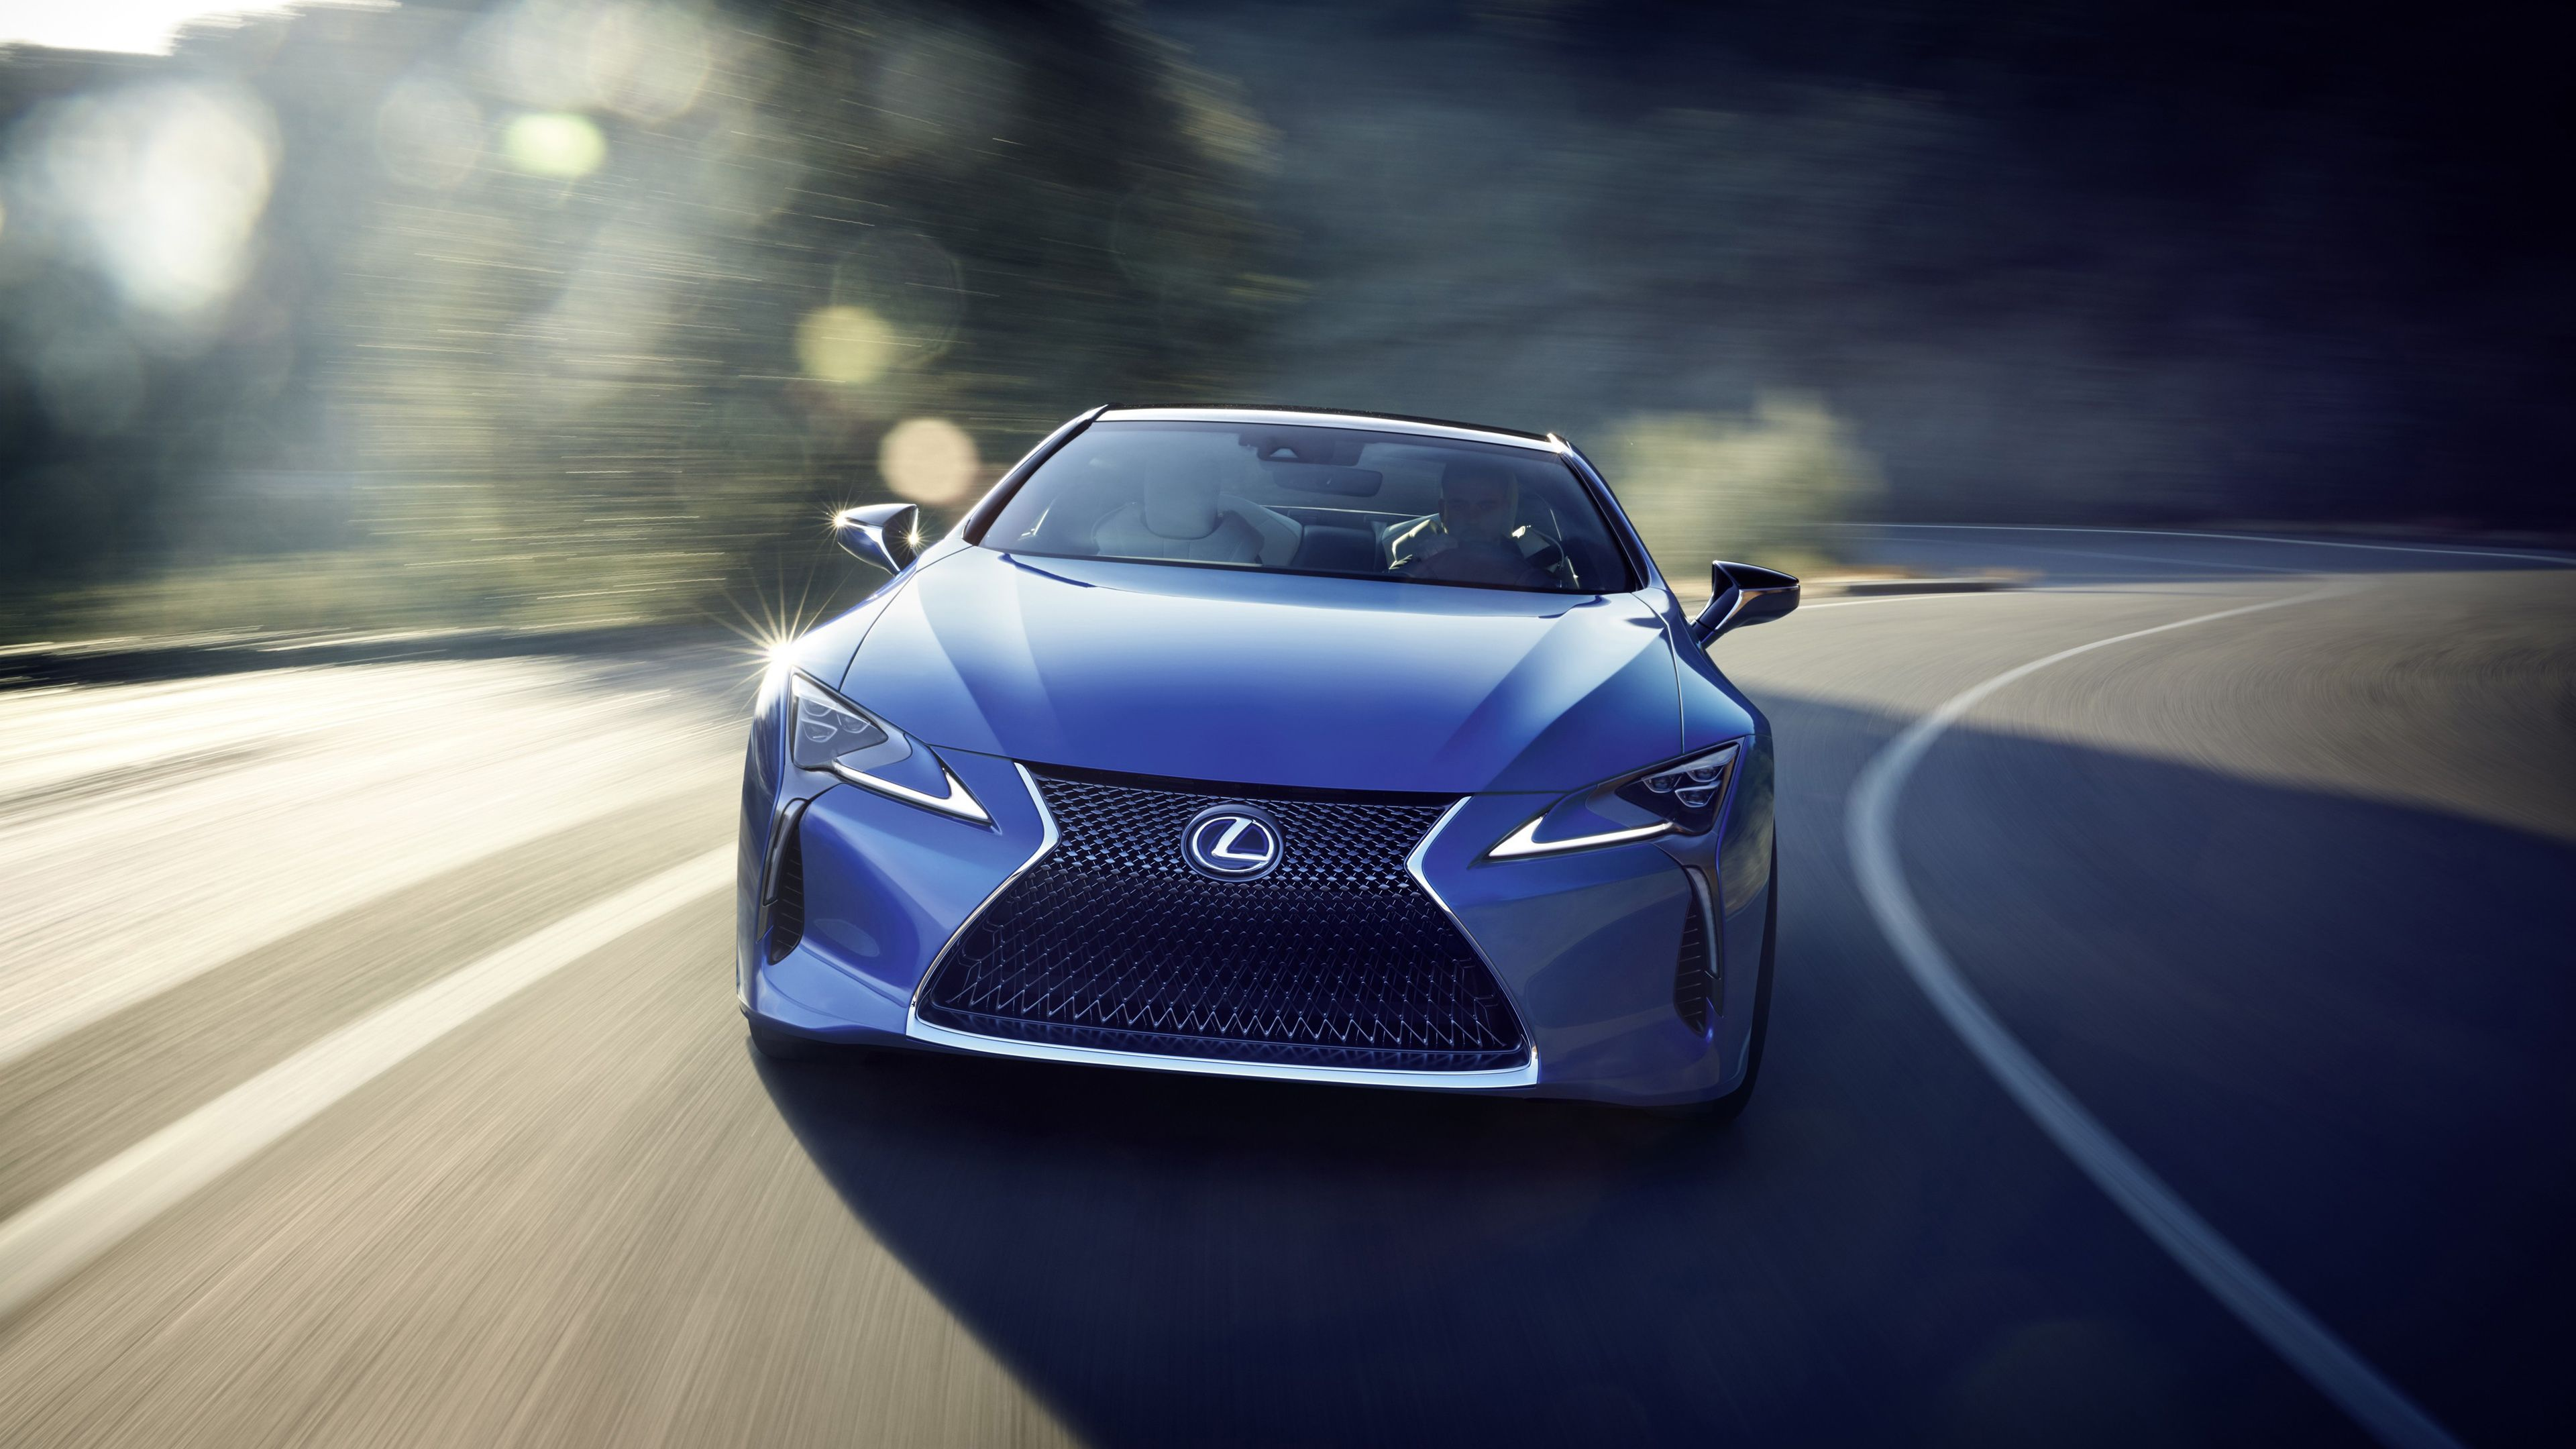 Lexus Wallpapers Top Free Lexus Backgrounds Wallpaperaccess